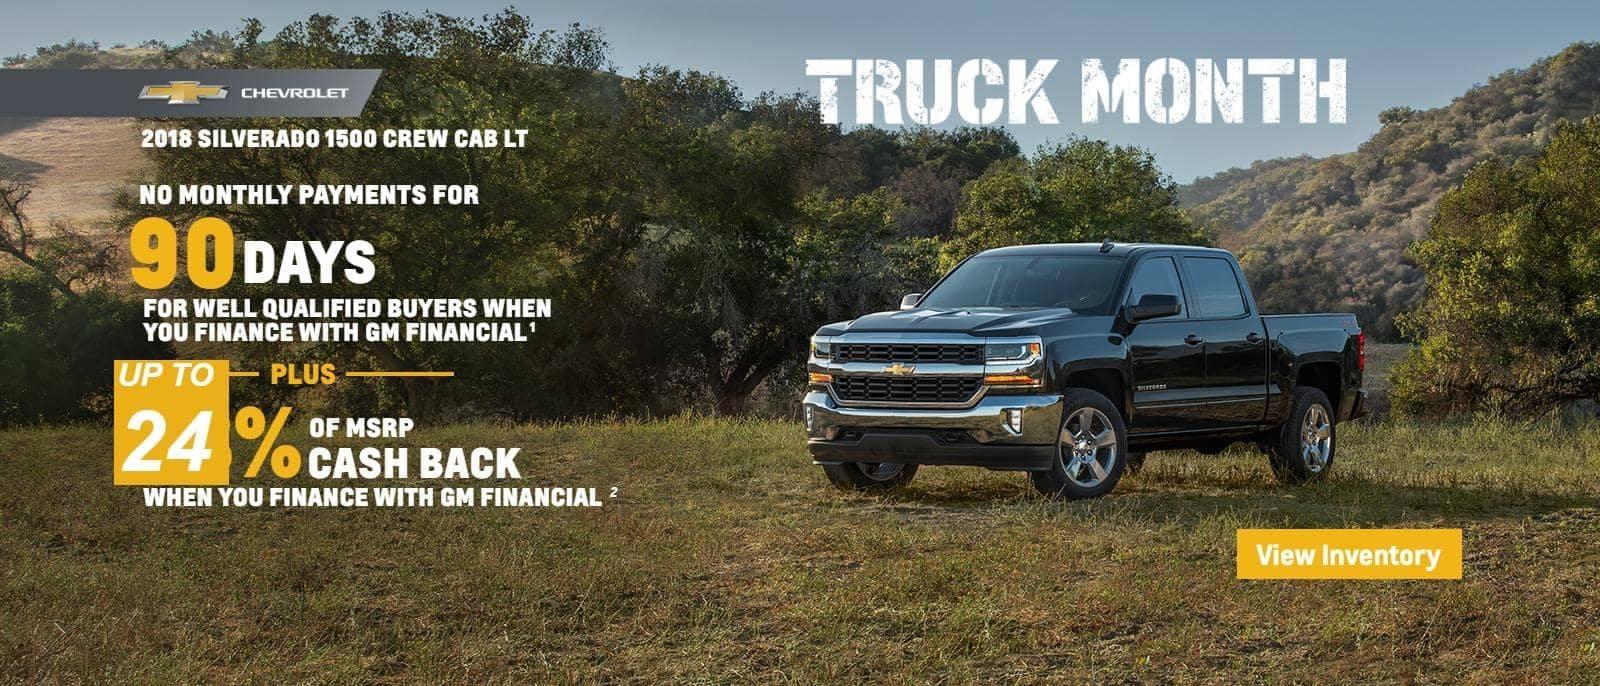 Truck Month 2018 Silverado 1500